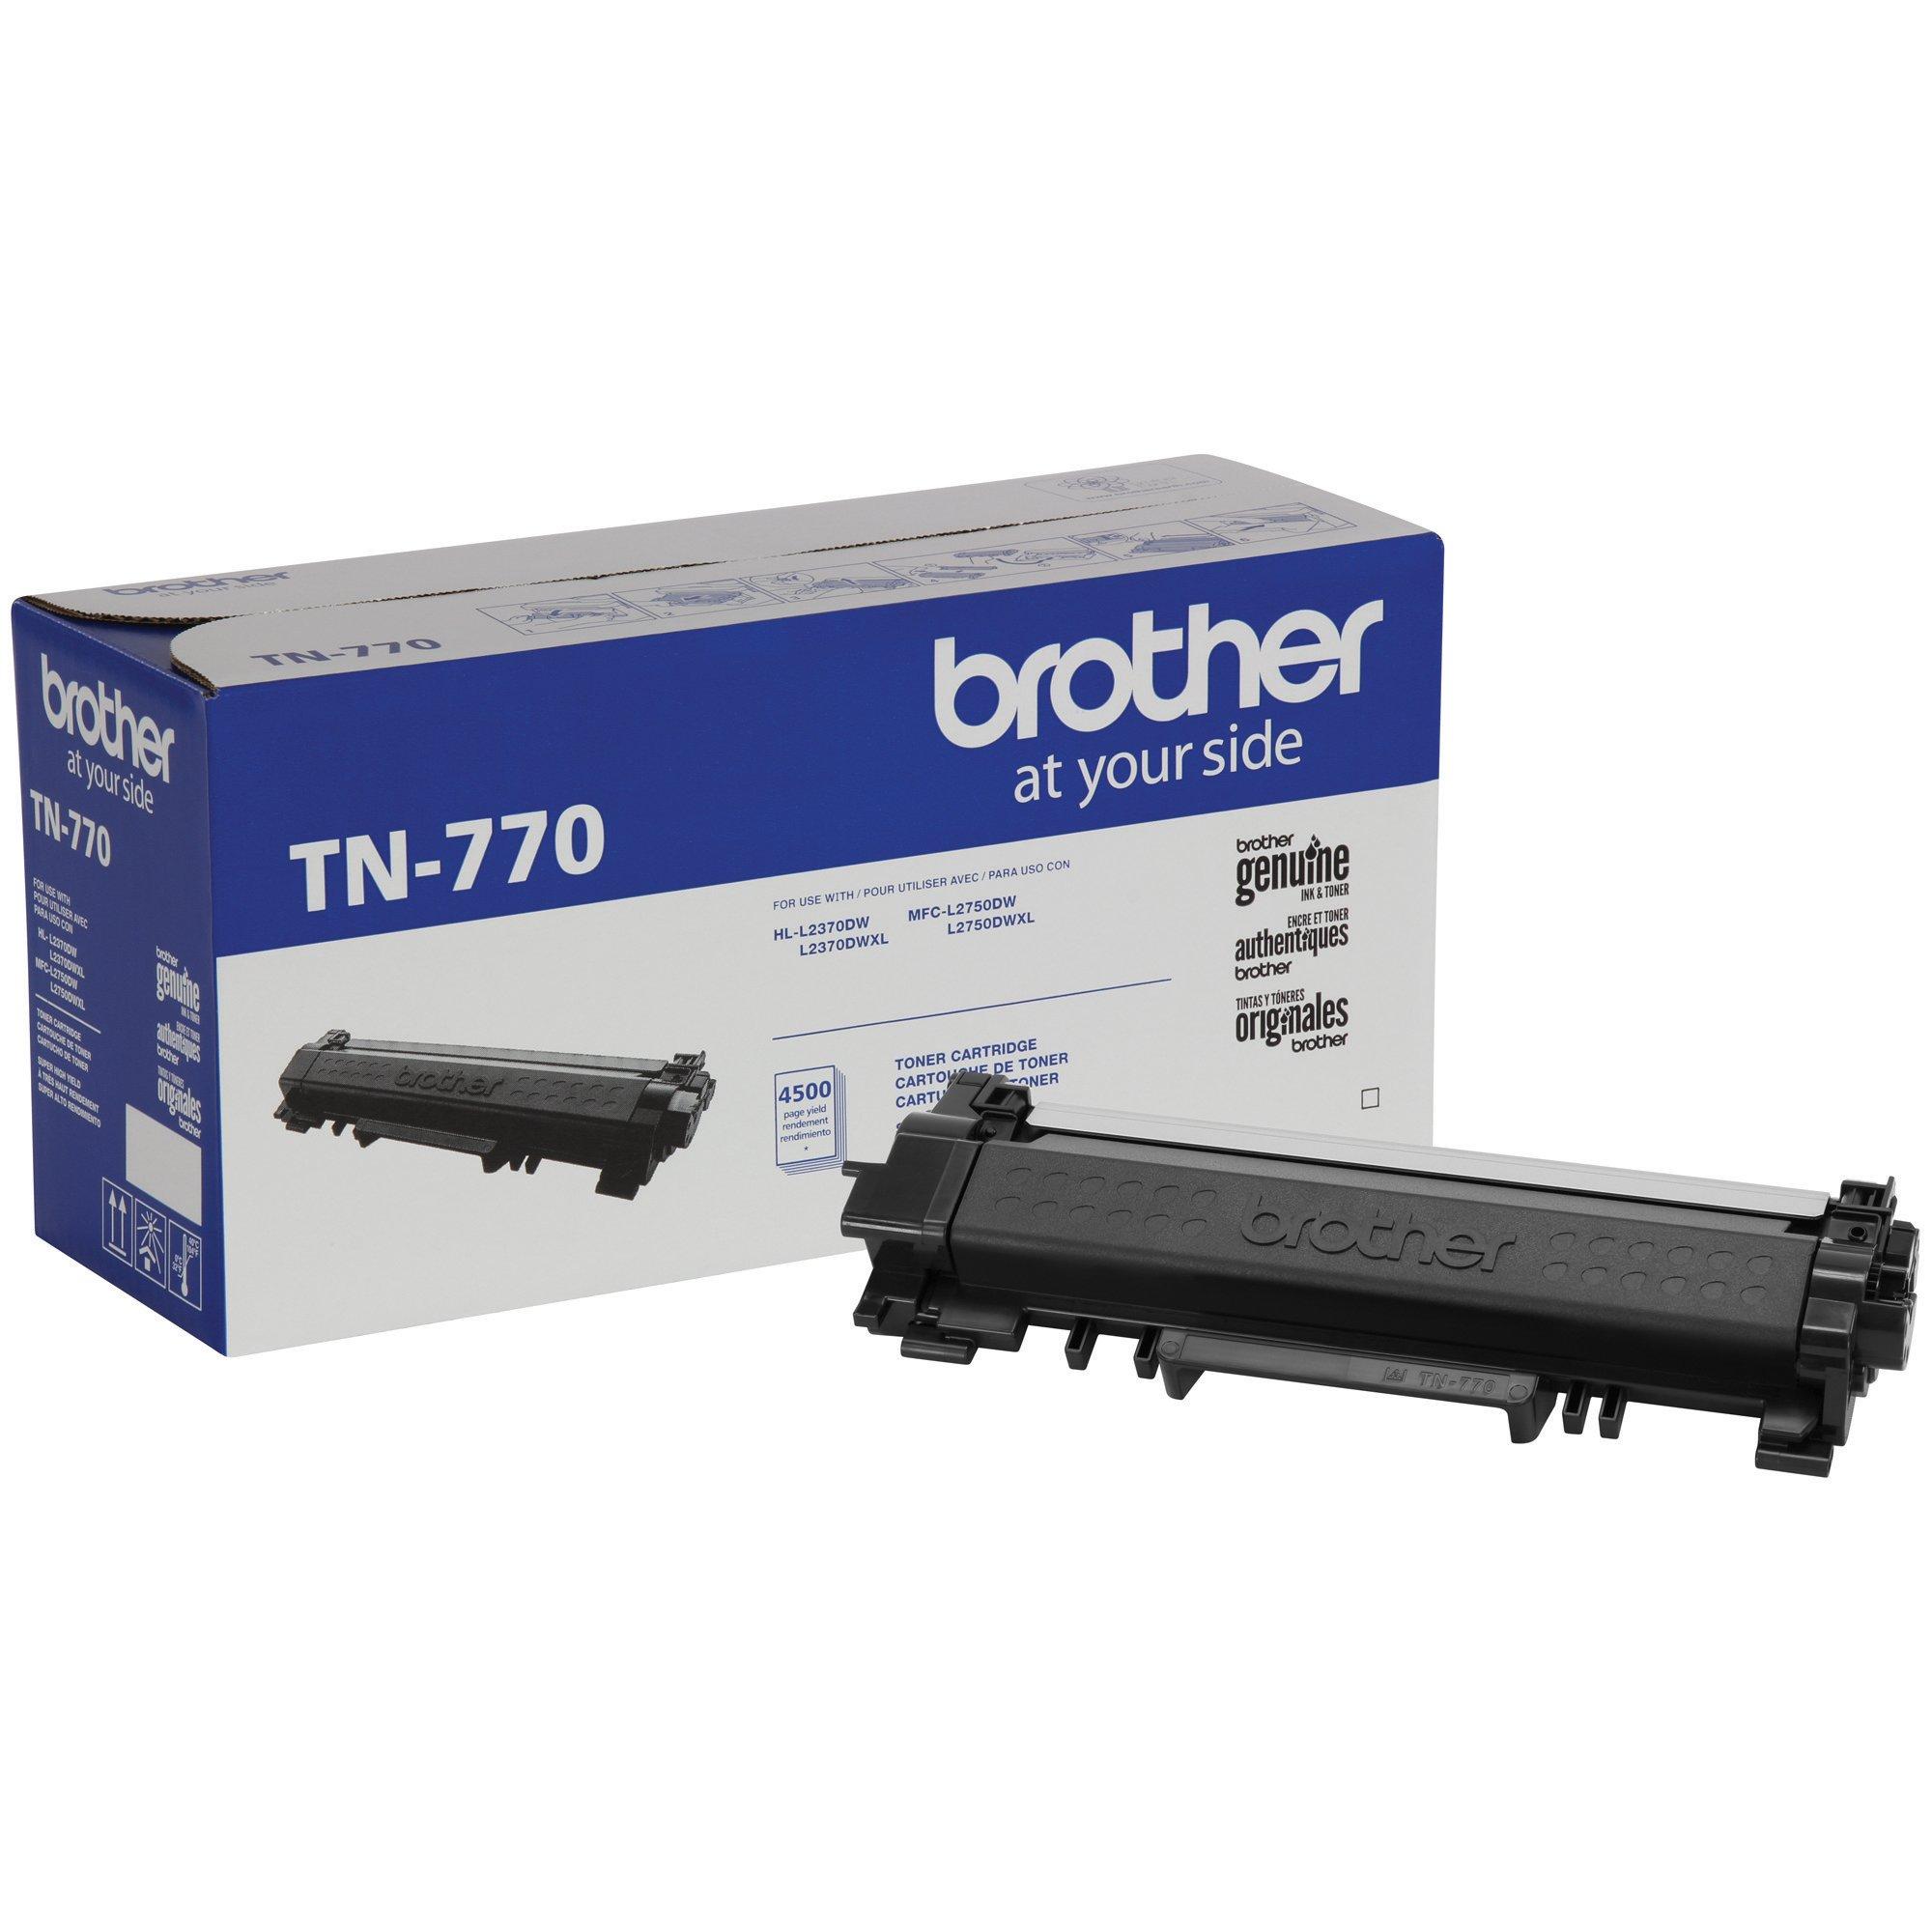 Brother Genuine TN770 Black Super High Yield Toner Cartridge, Up To 4,500 Page Yield, Amazon Dash Replenishment Cartridge